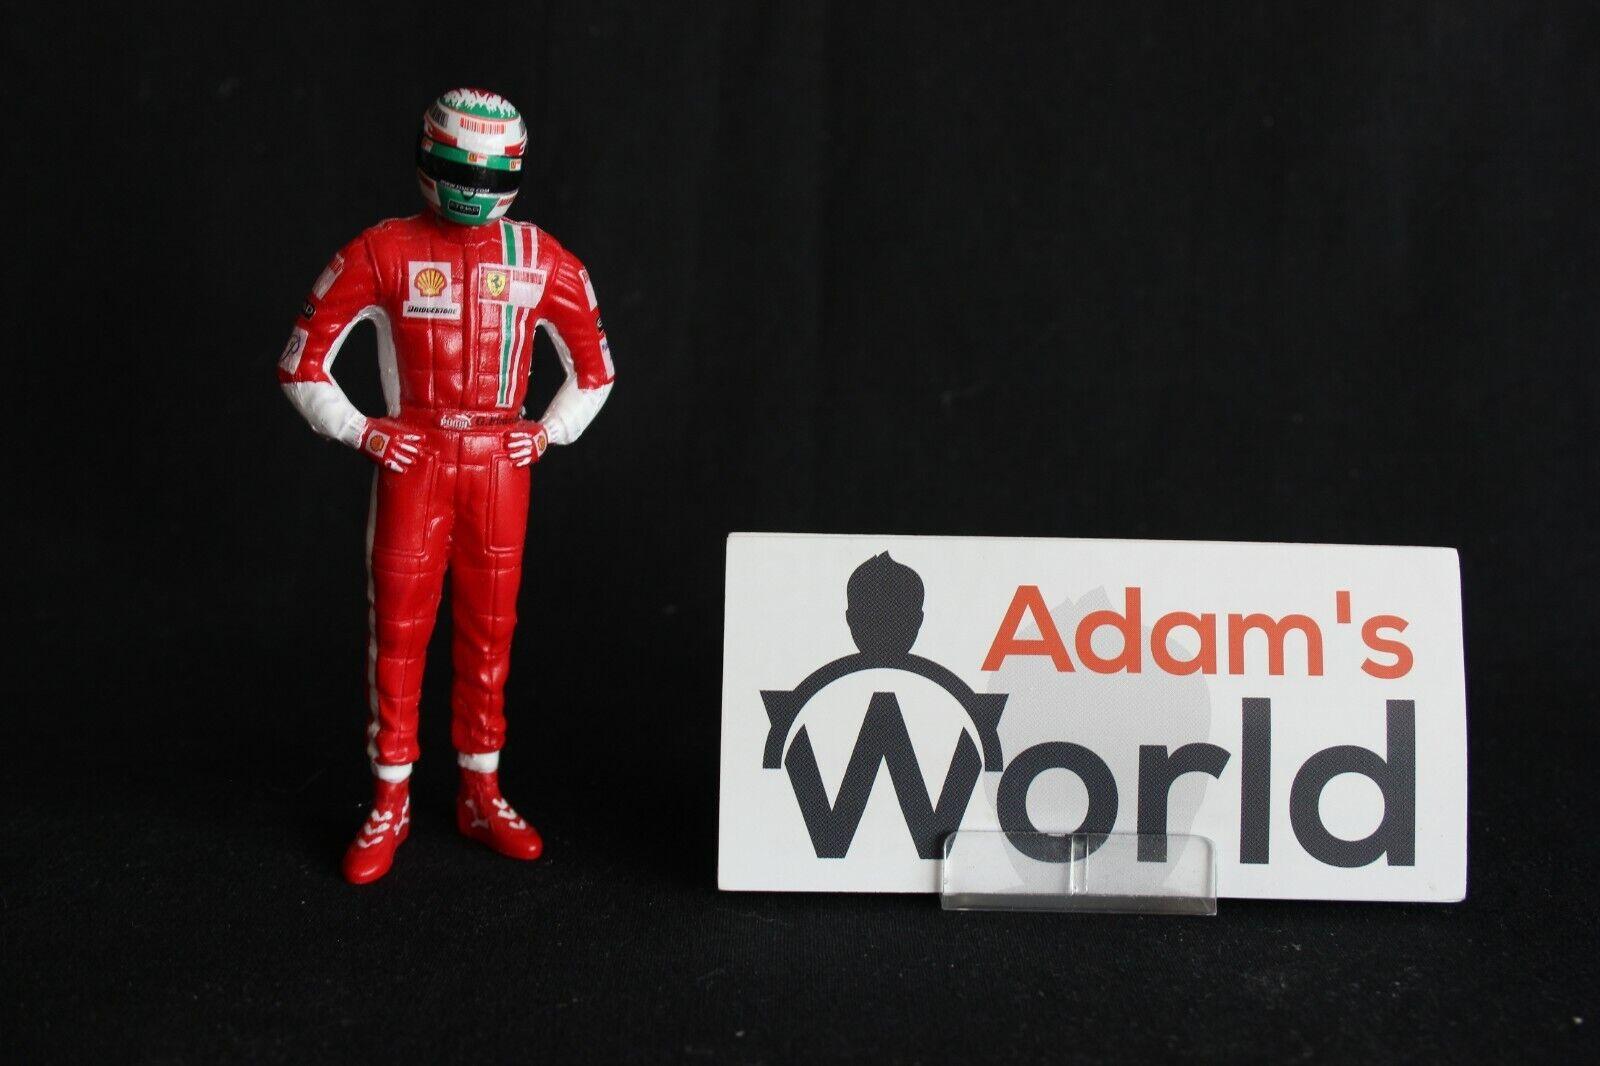 Figurine GianCochelo Fisichella (ITA) 1 18 Ferrari F1 2009 (PJBB)